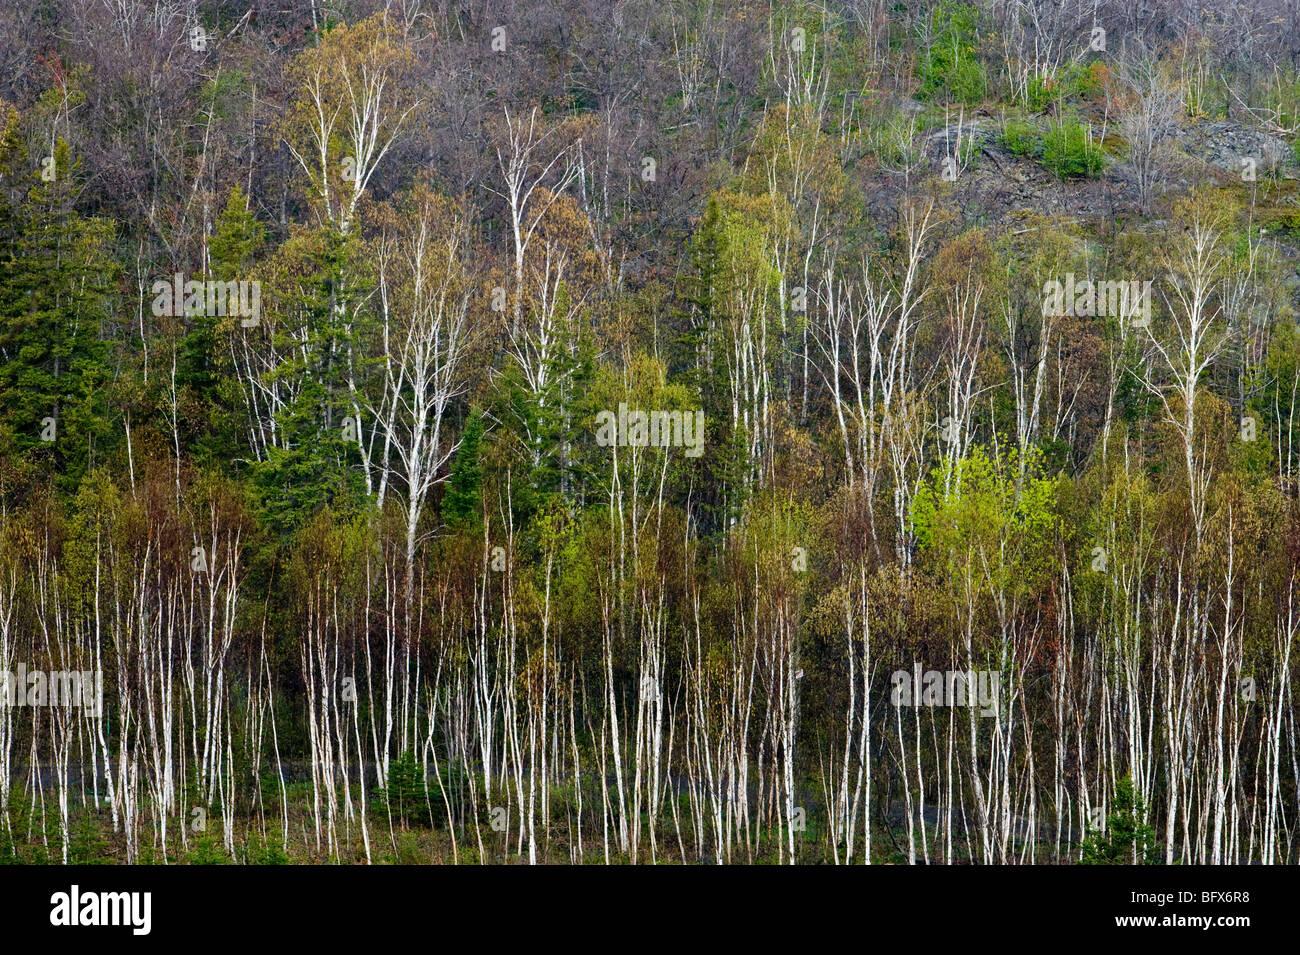 Hillside of white birch trees in Spring, Greater Sudbury, Ontario, Canada - Stock Image